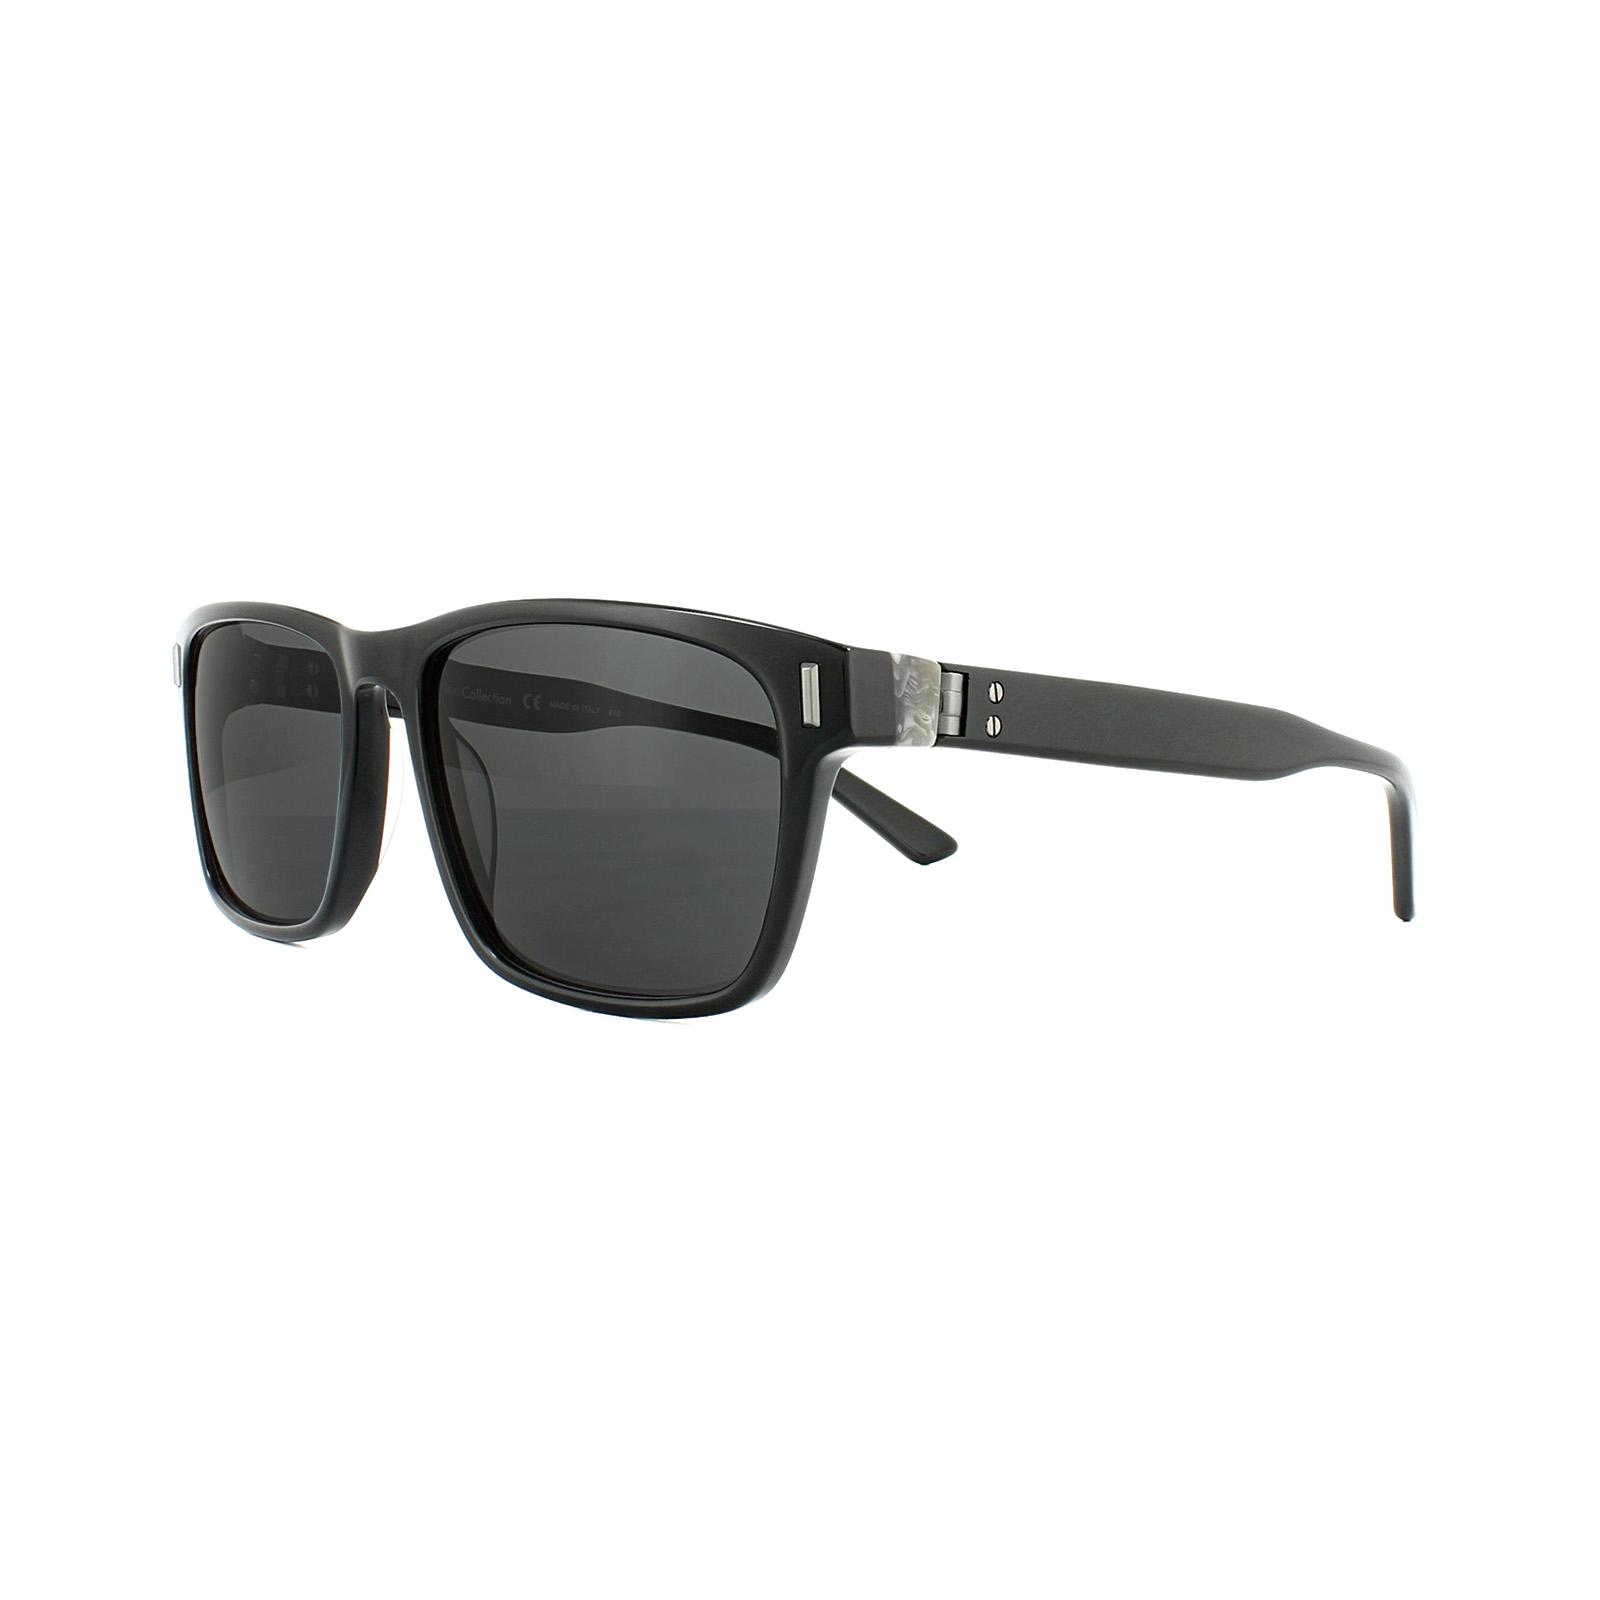 9bdc871d982 Calvin Klein Sunglasses CK8548S 001 Black Grey 750779104835